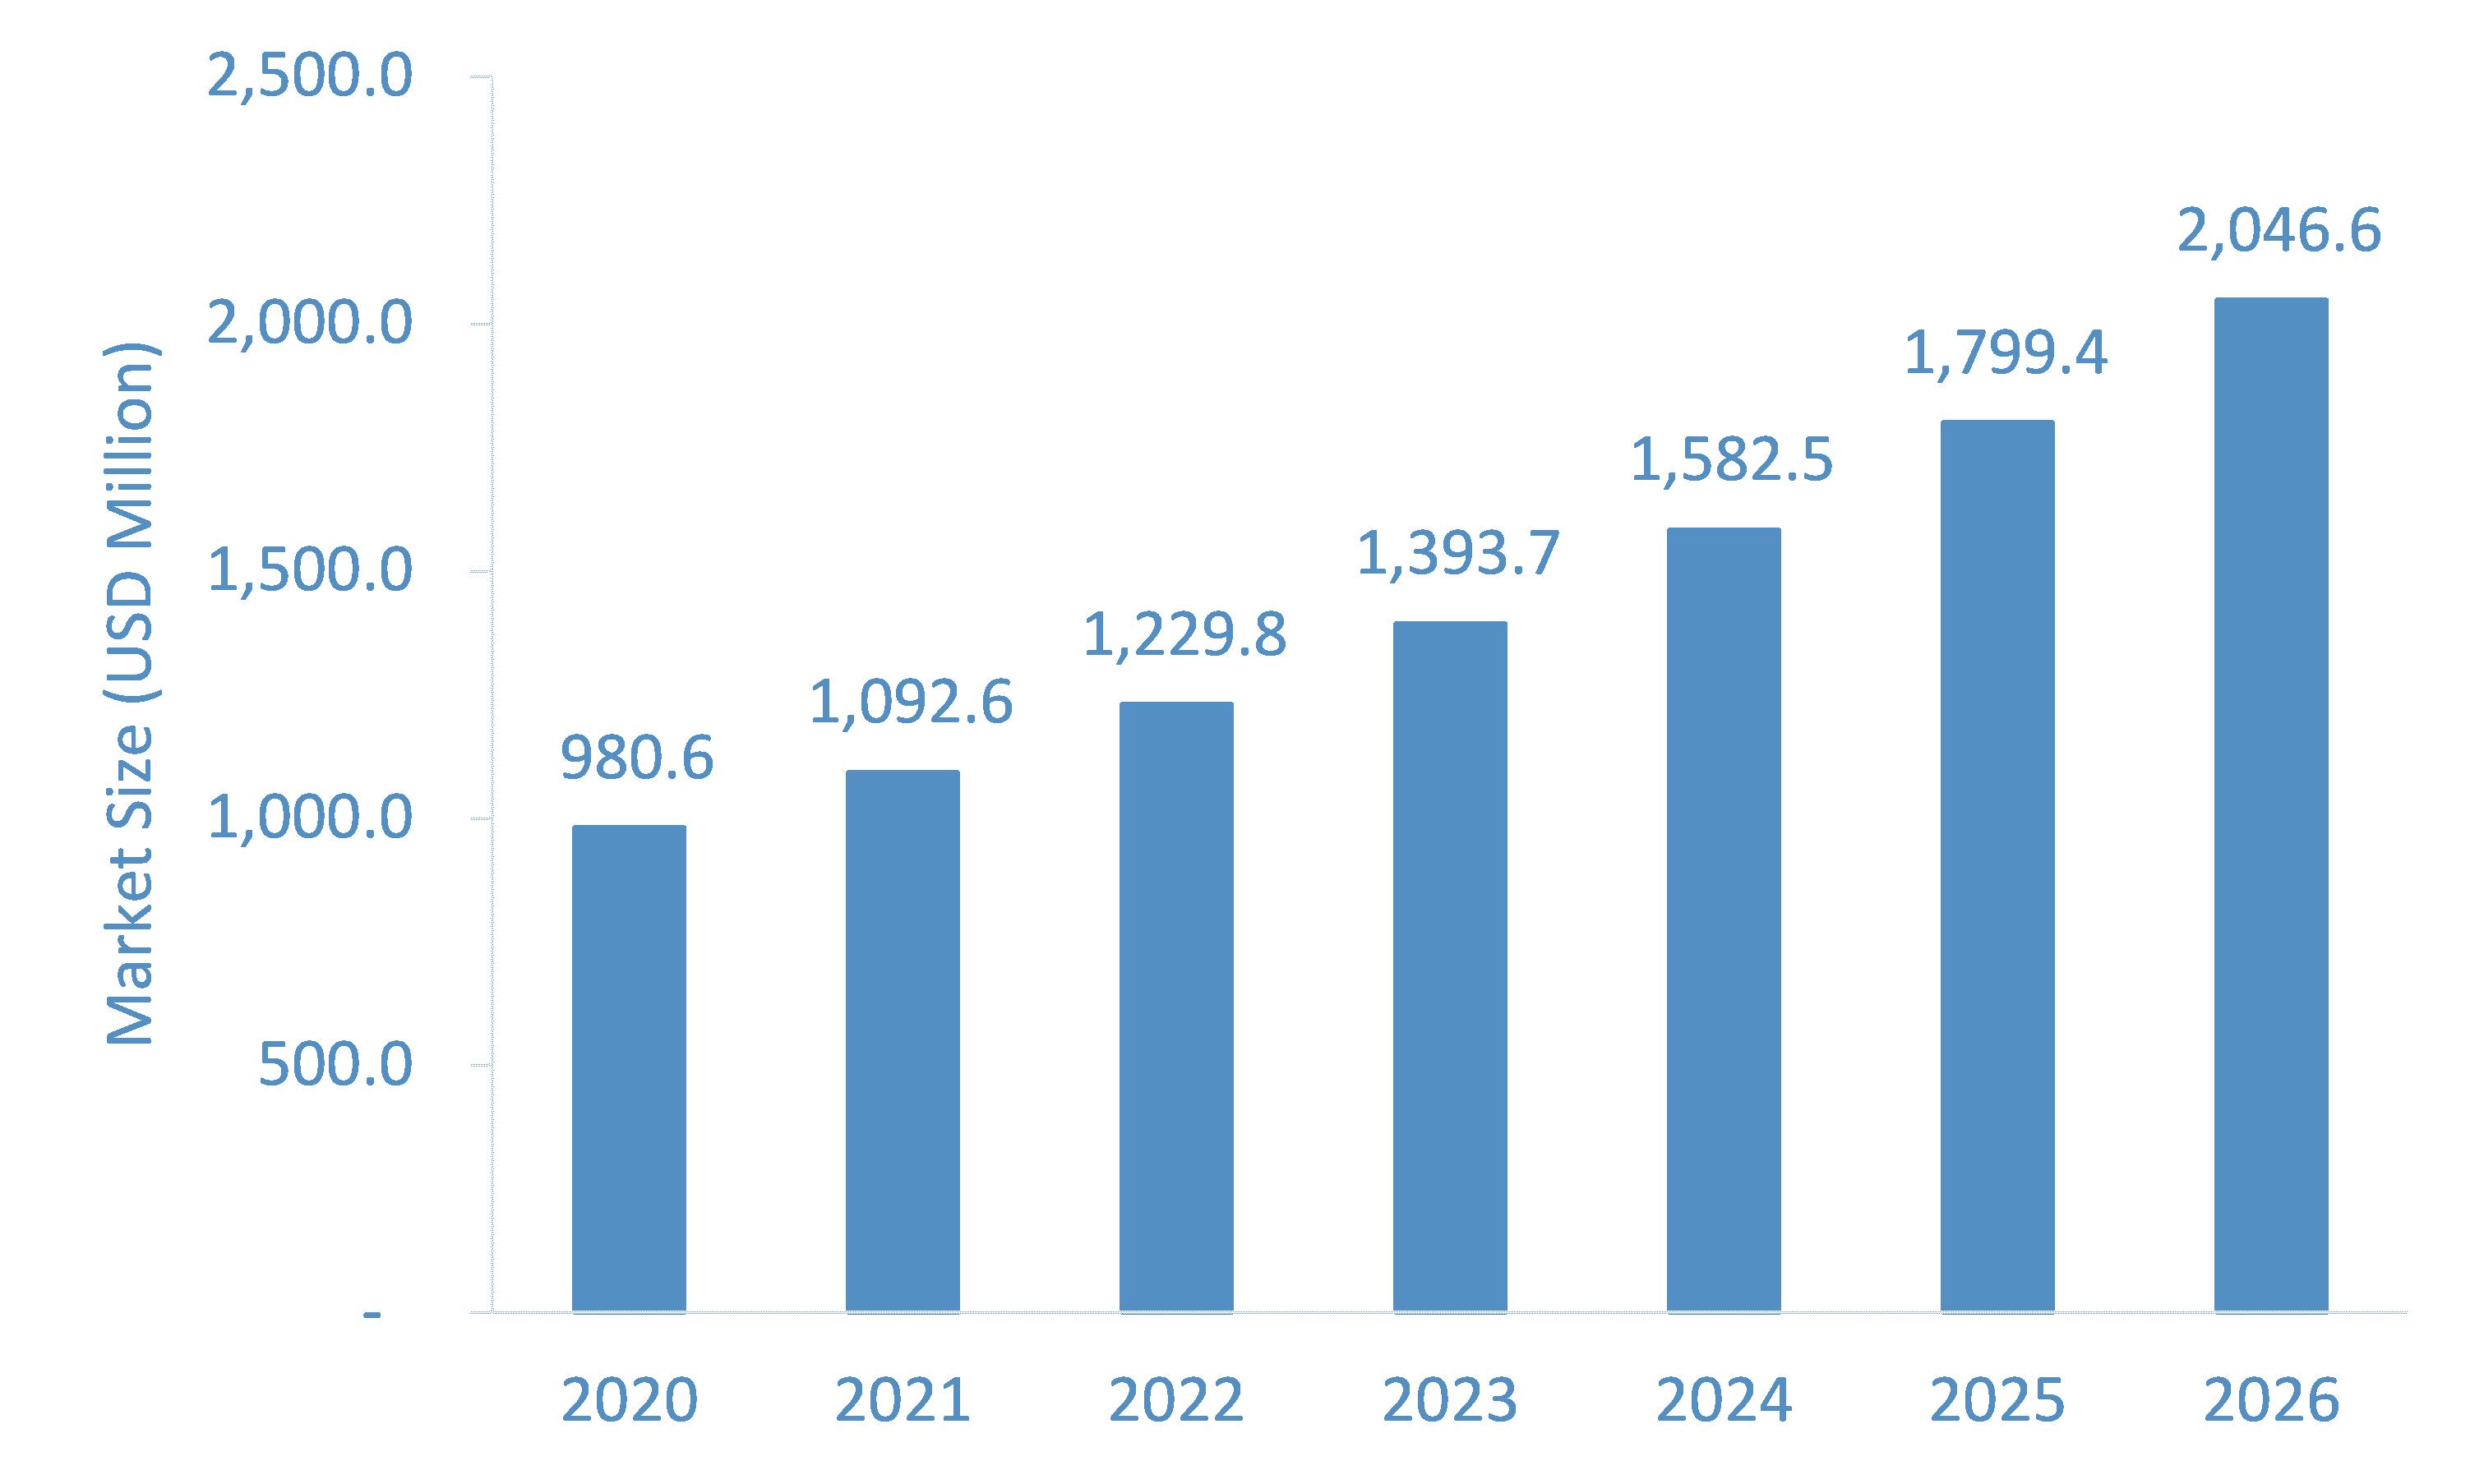 Spinal Muscular Atrophy Medicine Market Growth Trends & Forecast till 2026